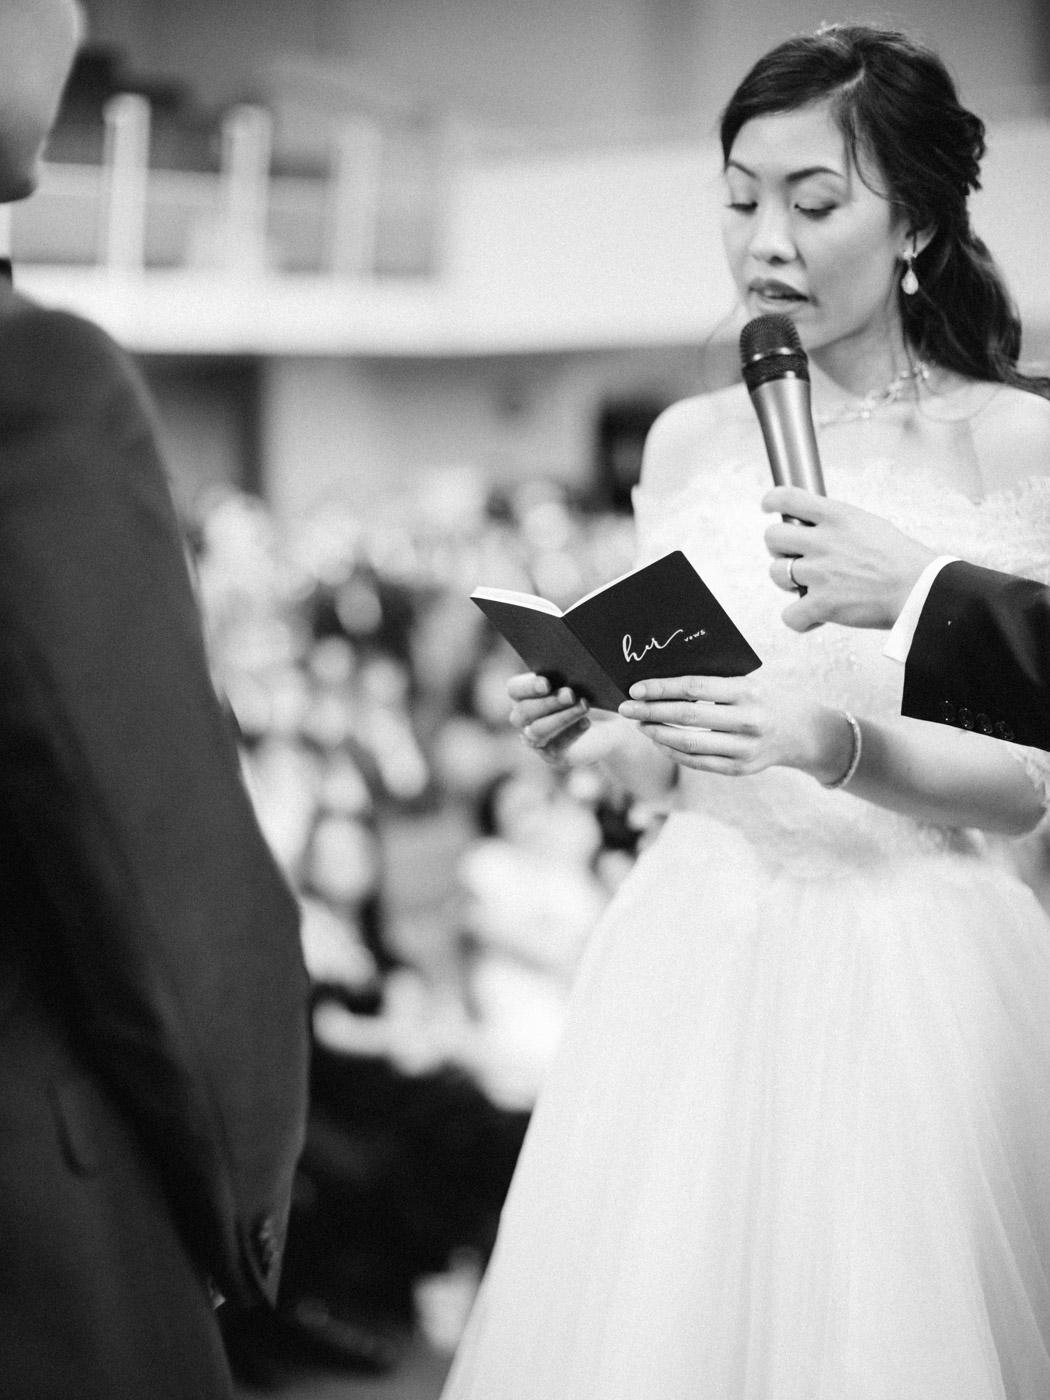 toronto_wedding_photographer_documentary_fine_art_photography-62.jpg